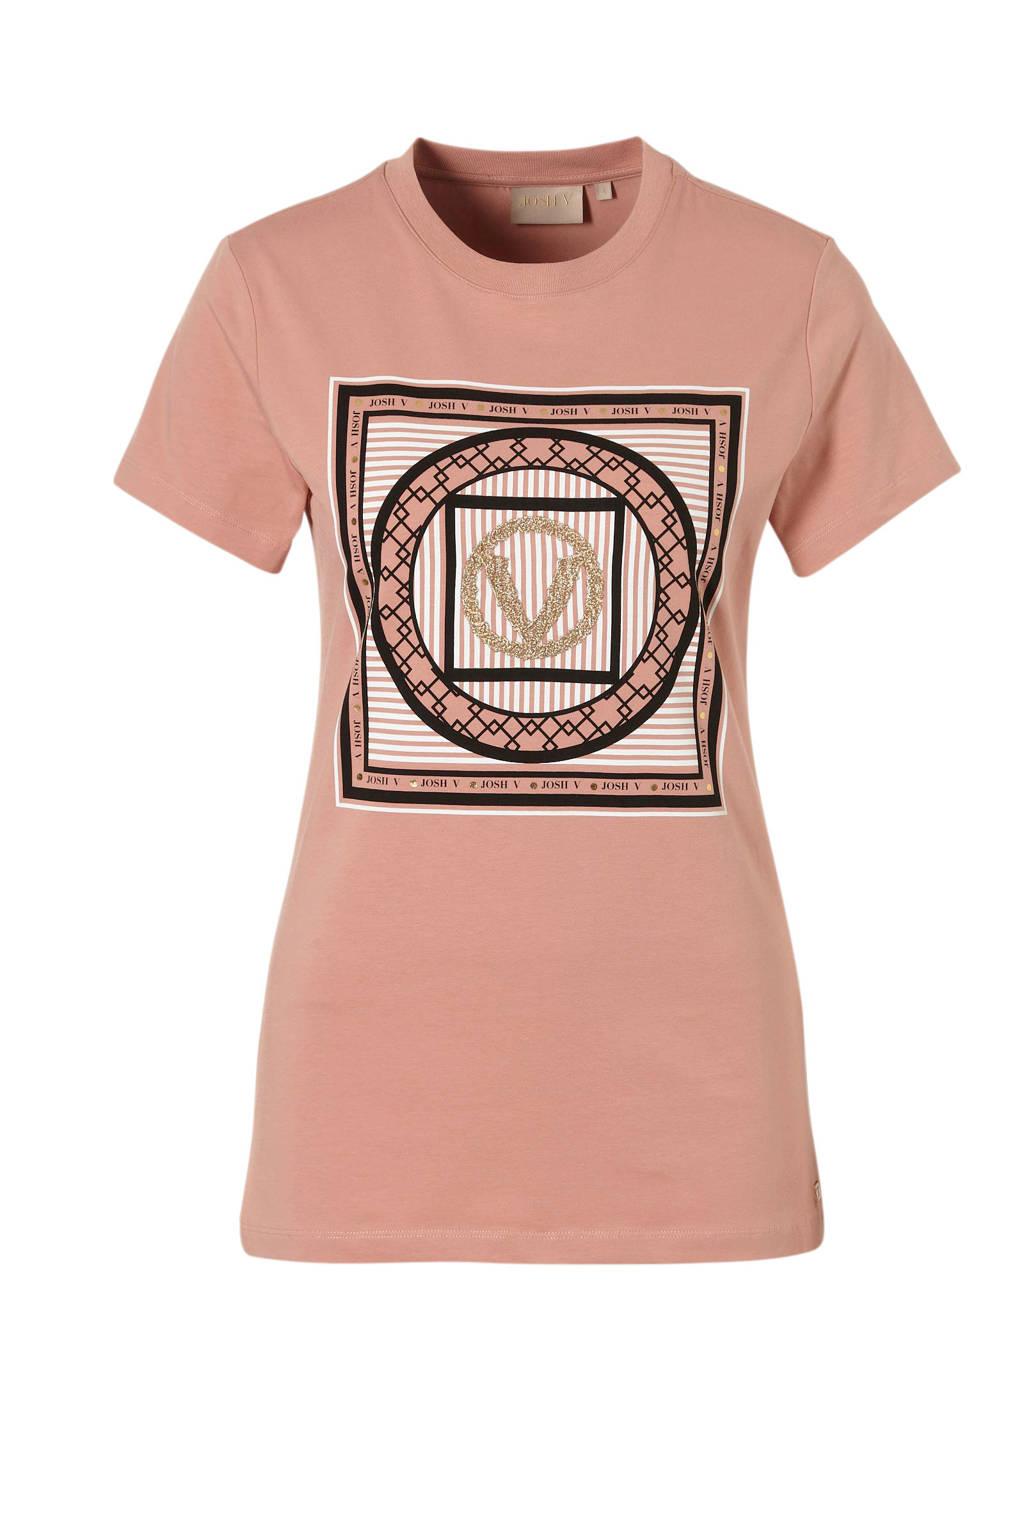 JOSH V T-shirt met logo, Roze/ zwart/ goud